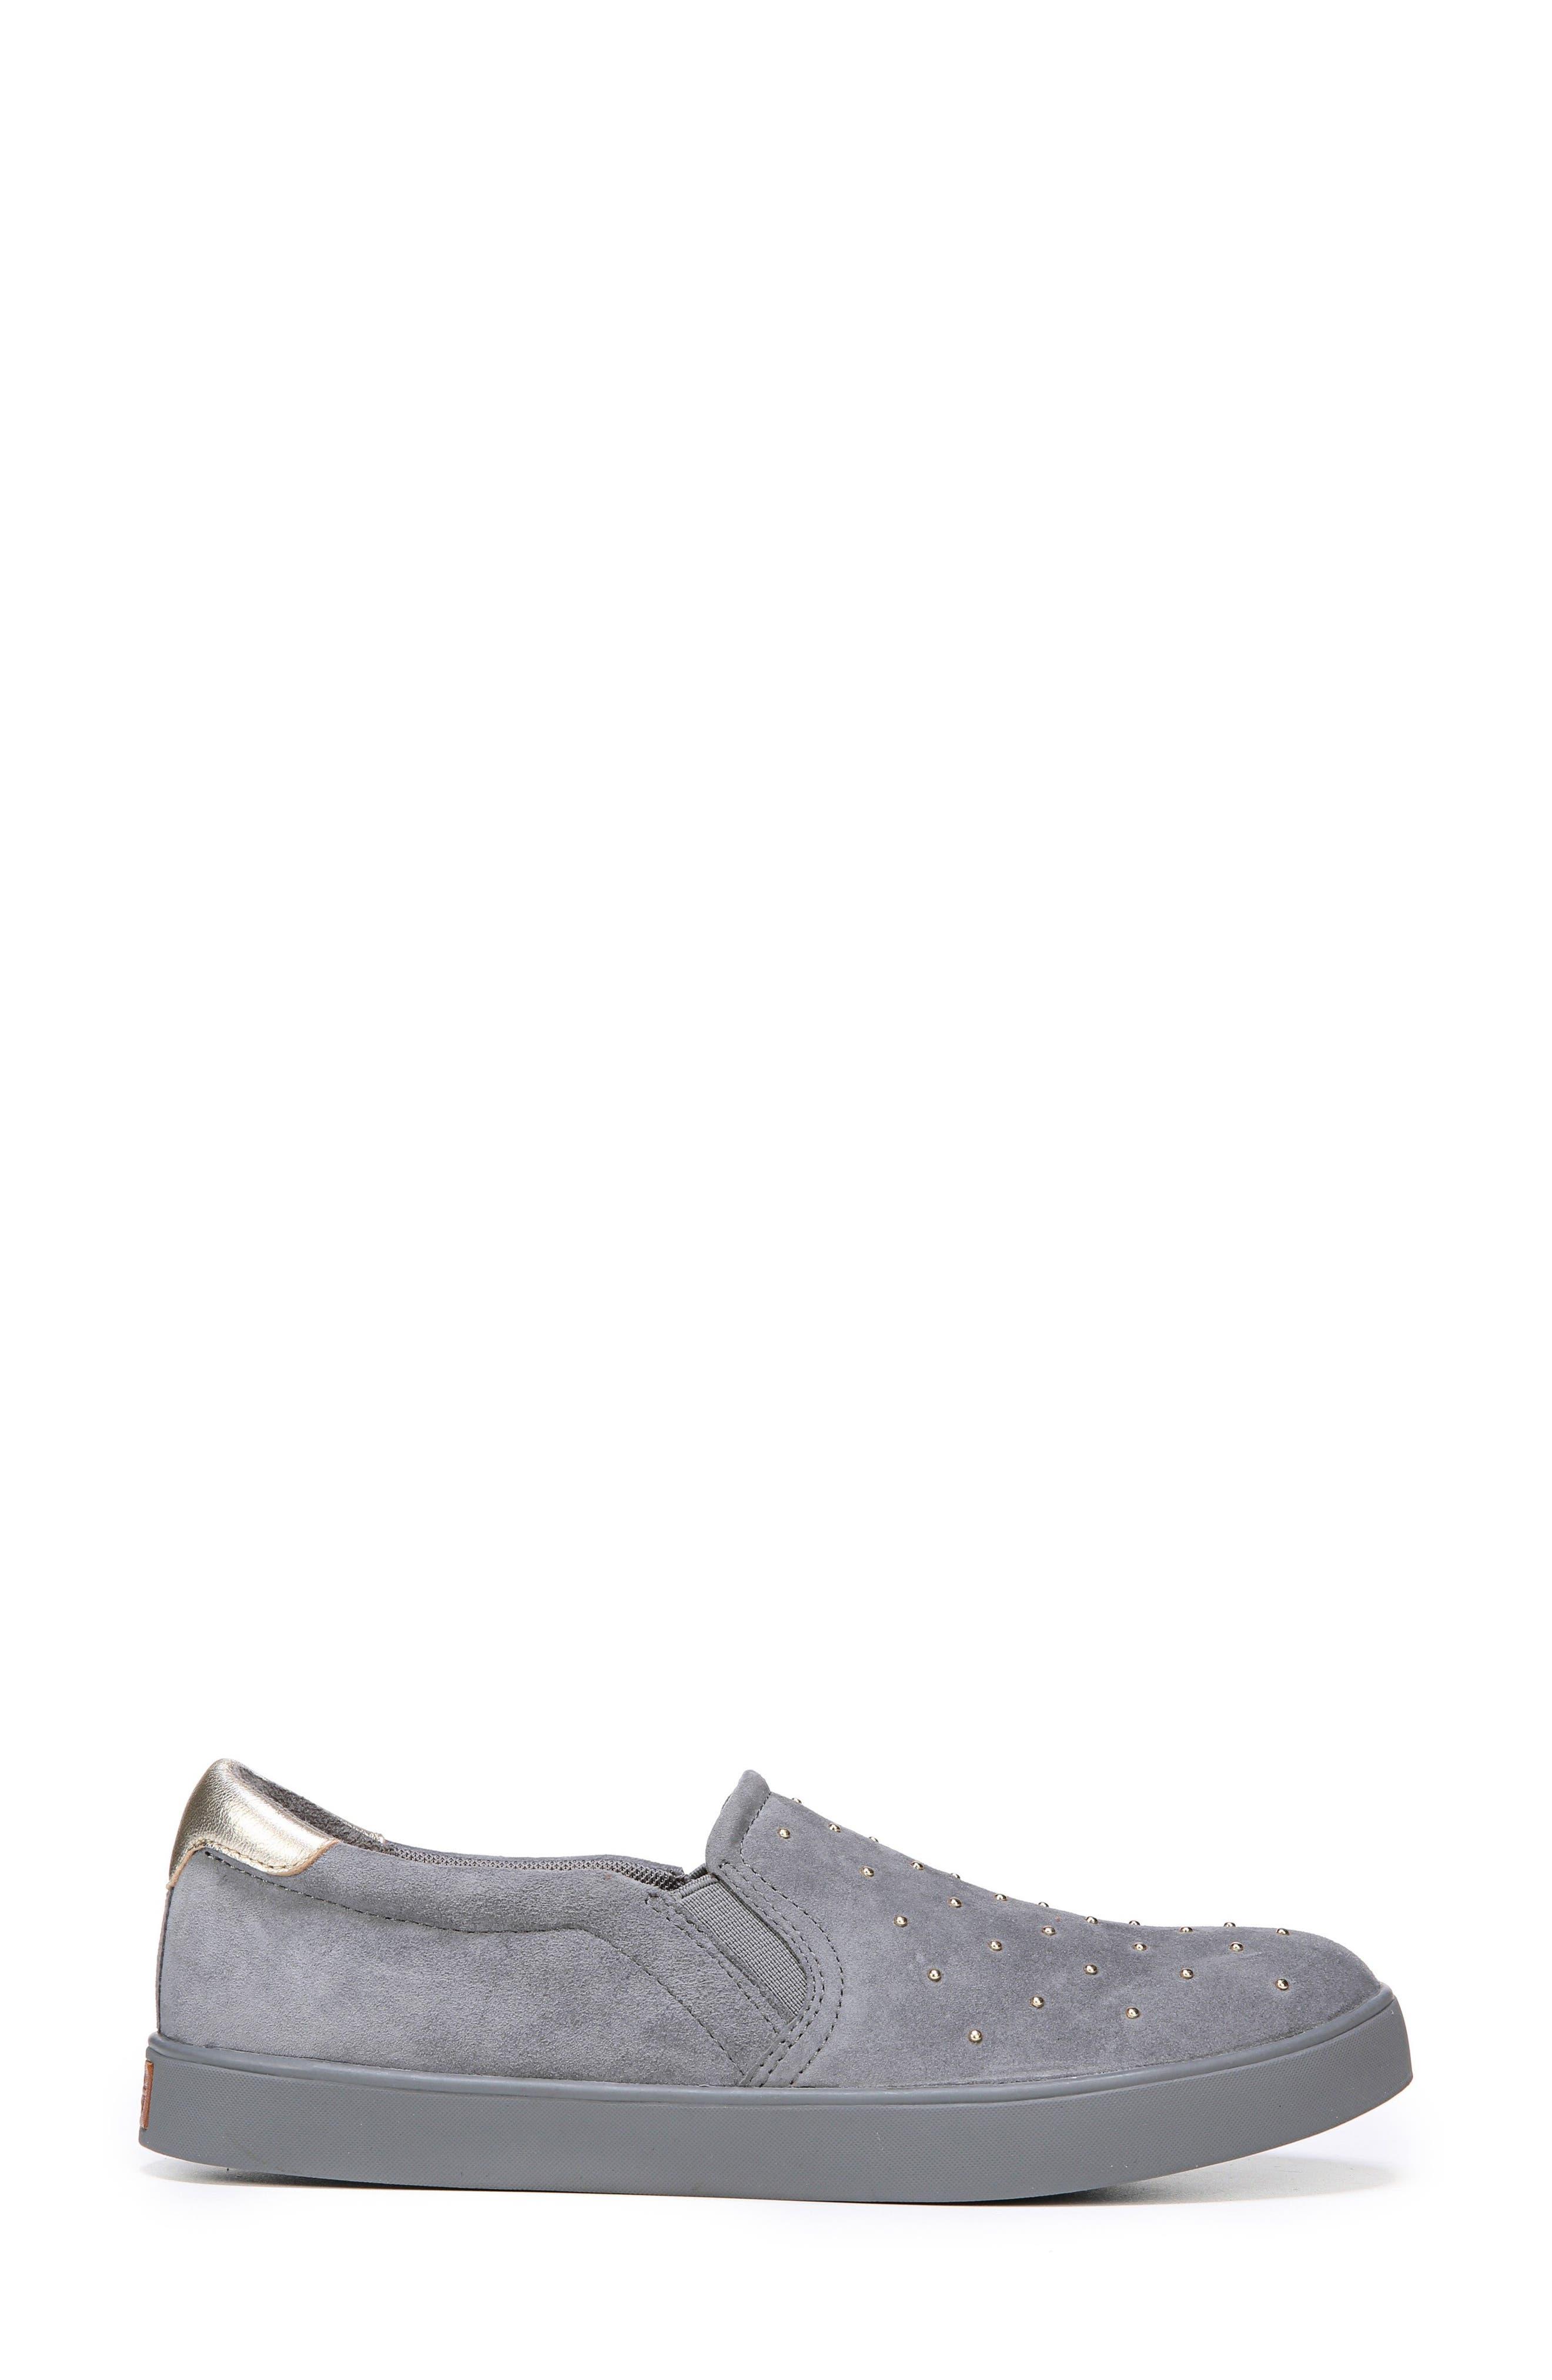 Alternate Image 3  - Dr. Scholl's Original Collection 'Scout' Slip On Sneaker (Women)